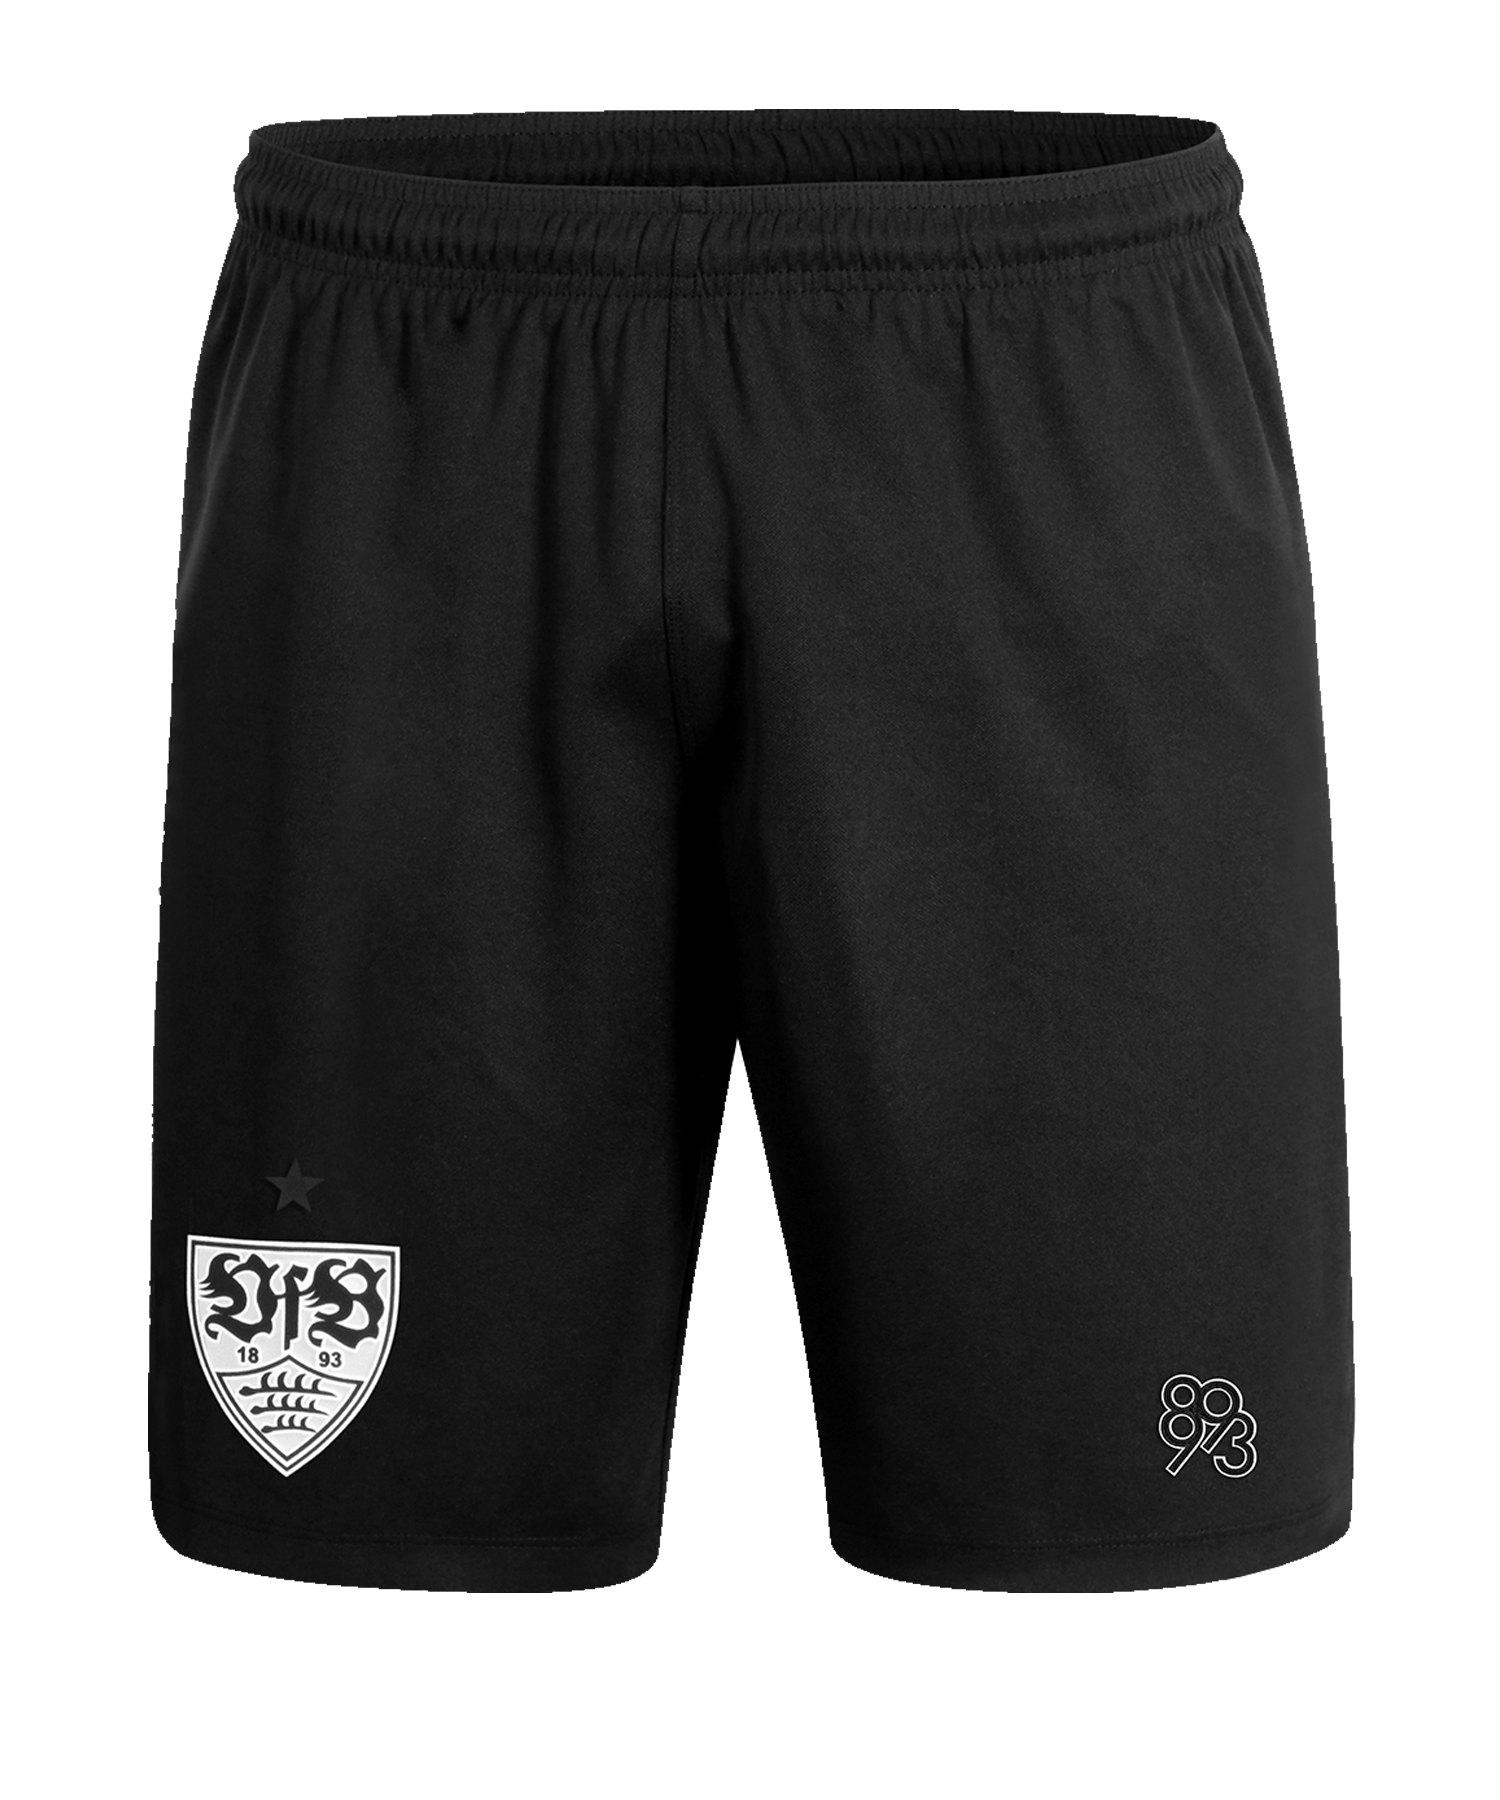 Jako VfB Stuttgart Short 3rd 2019/2020 Kids Schwarz F08 - schwarz